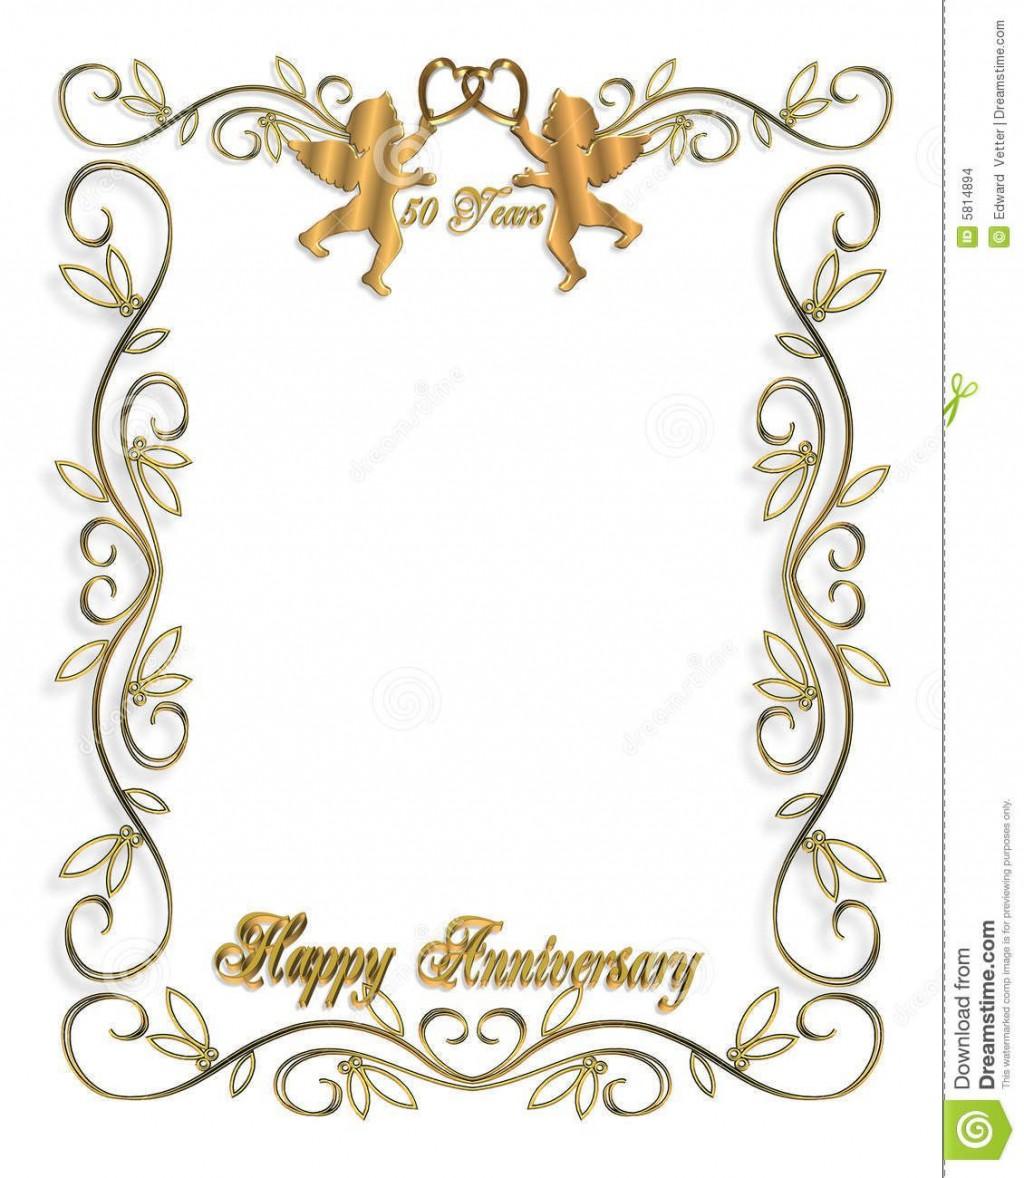 010 Formidable 50th Anniversary Invitation Template Free Download Sample  Golden WeddingLarge